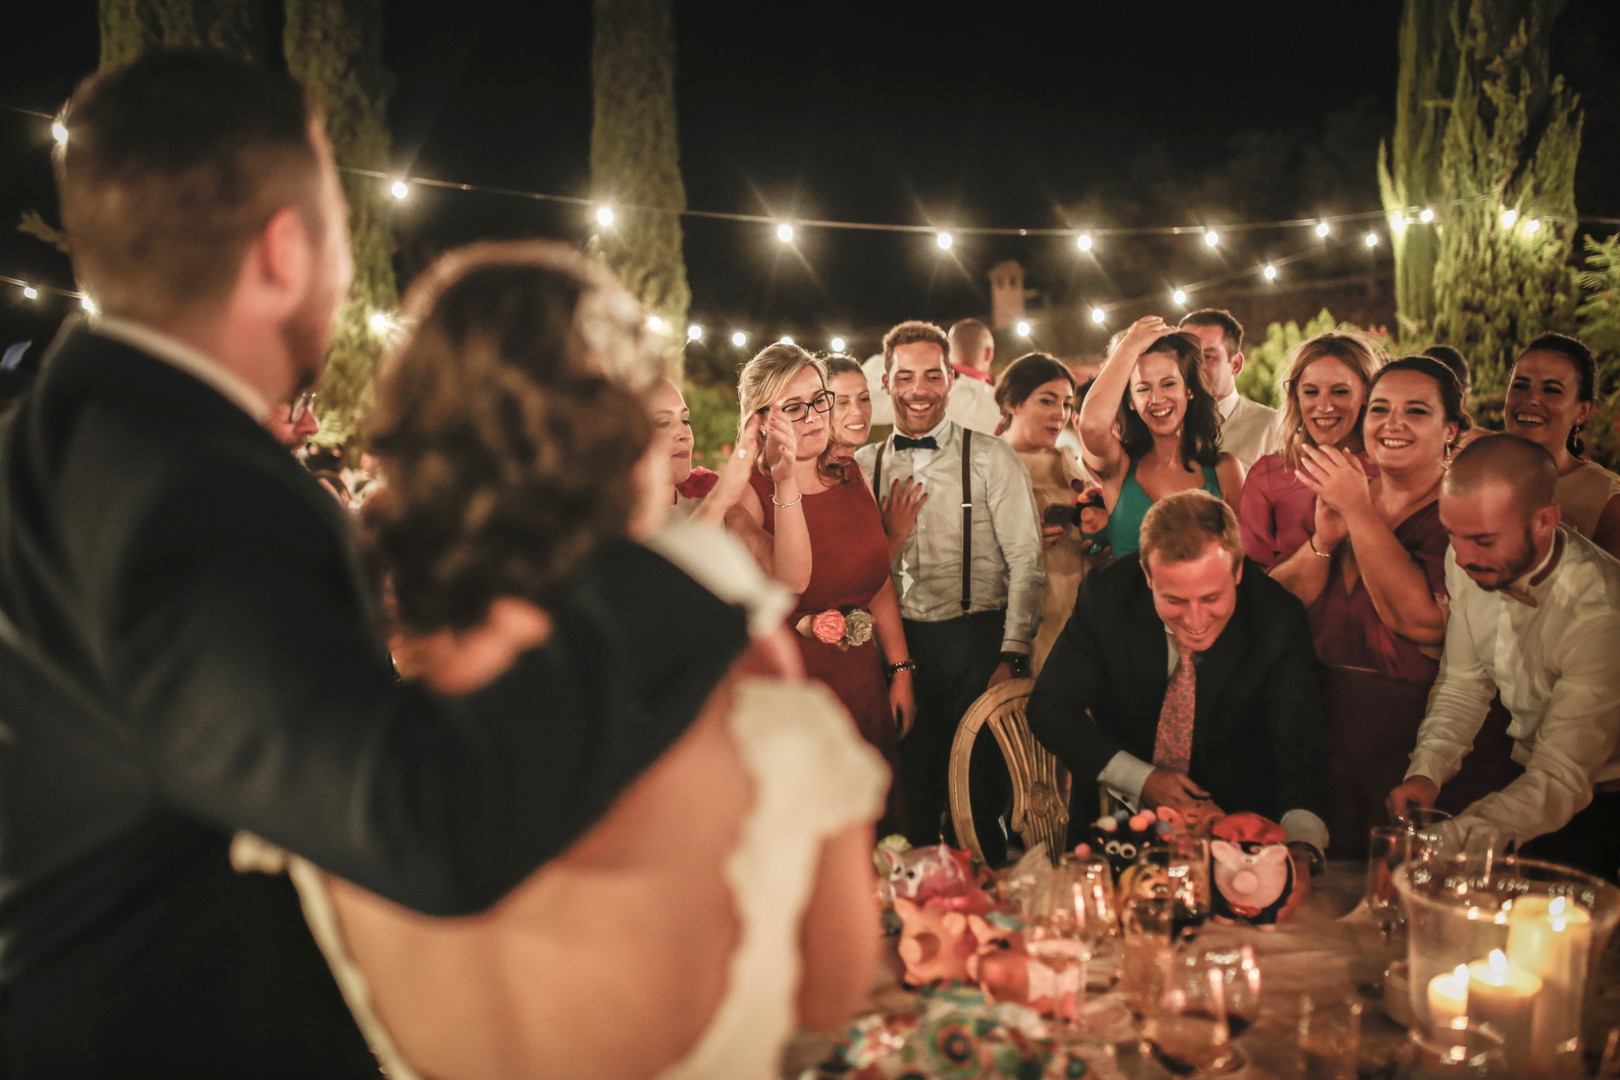 A_S - Banquete-195.jpg